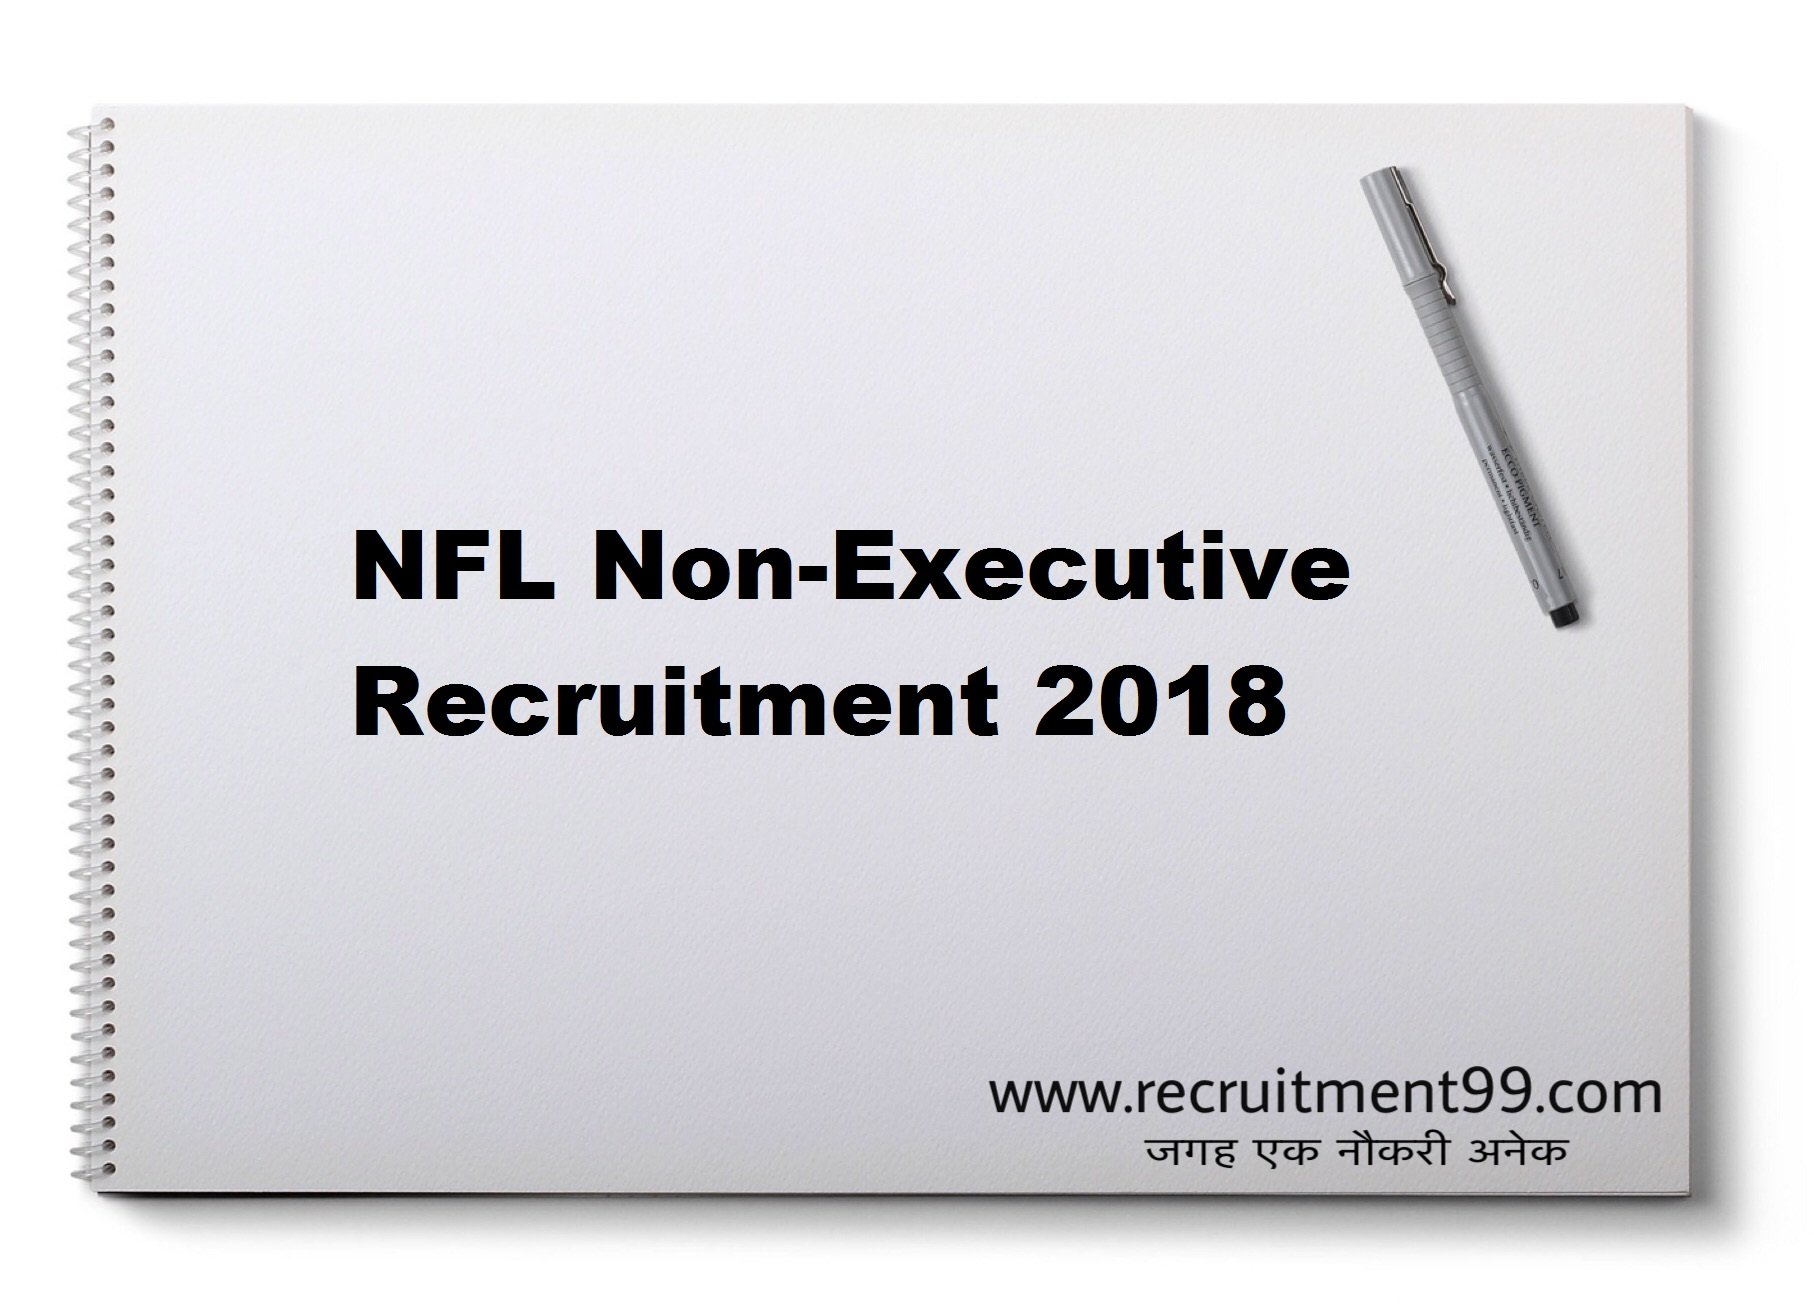 NFL Non-Executive Recruitment Admit Card Result 2018